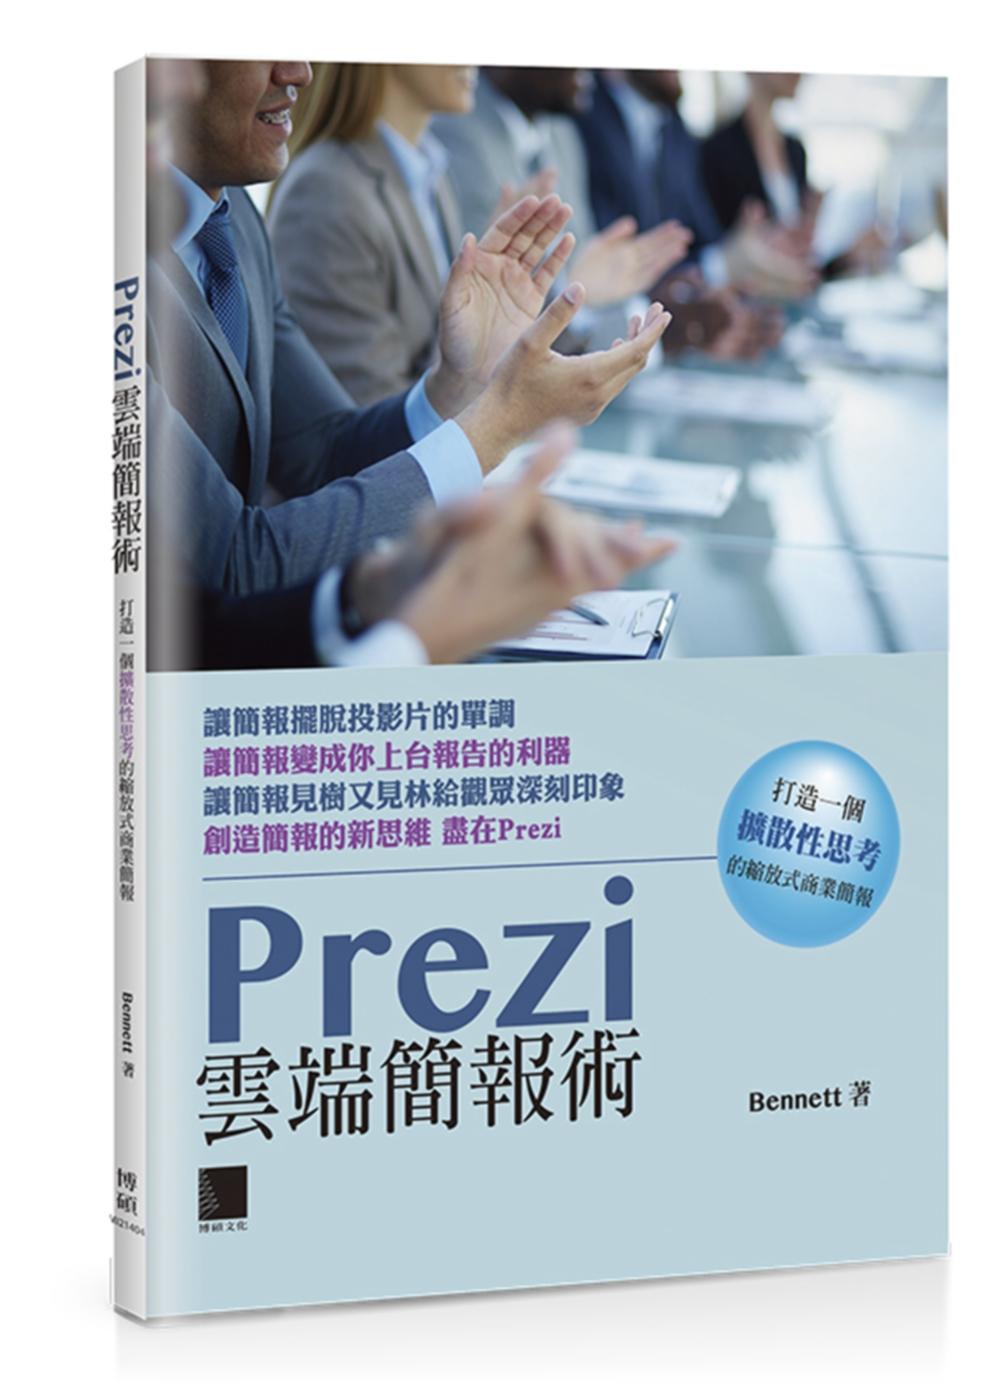 Prezi雲端簡報術:打造一個擴散性思考的縮放式商業簡報